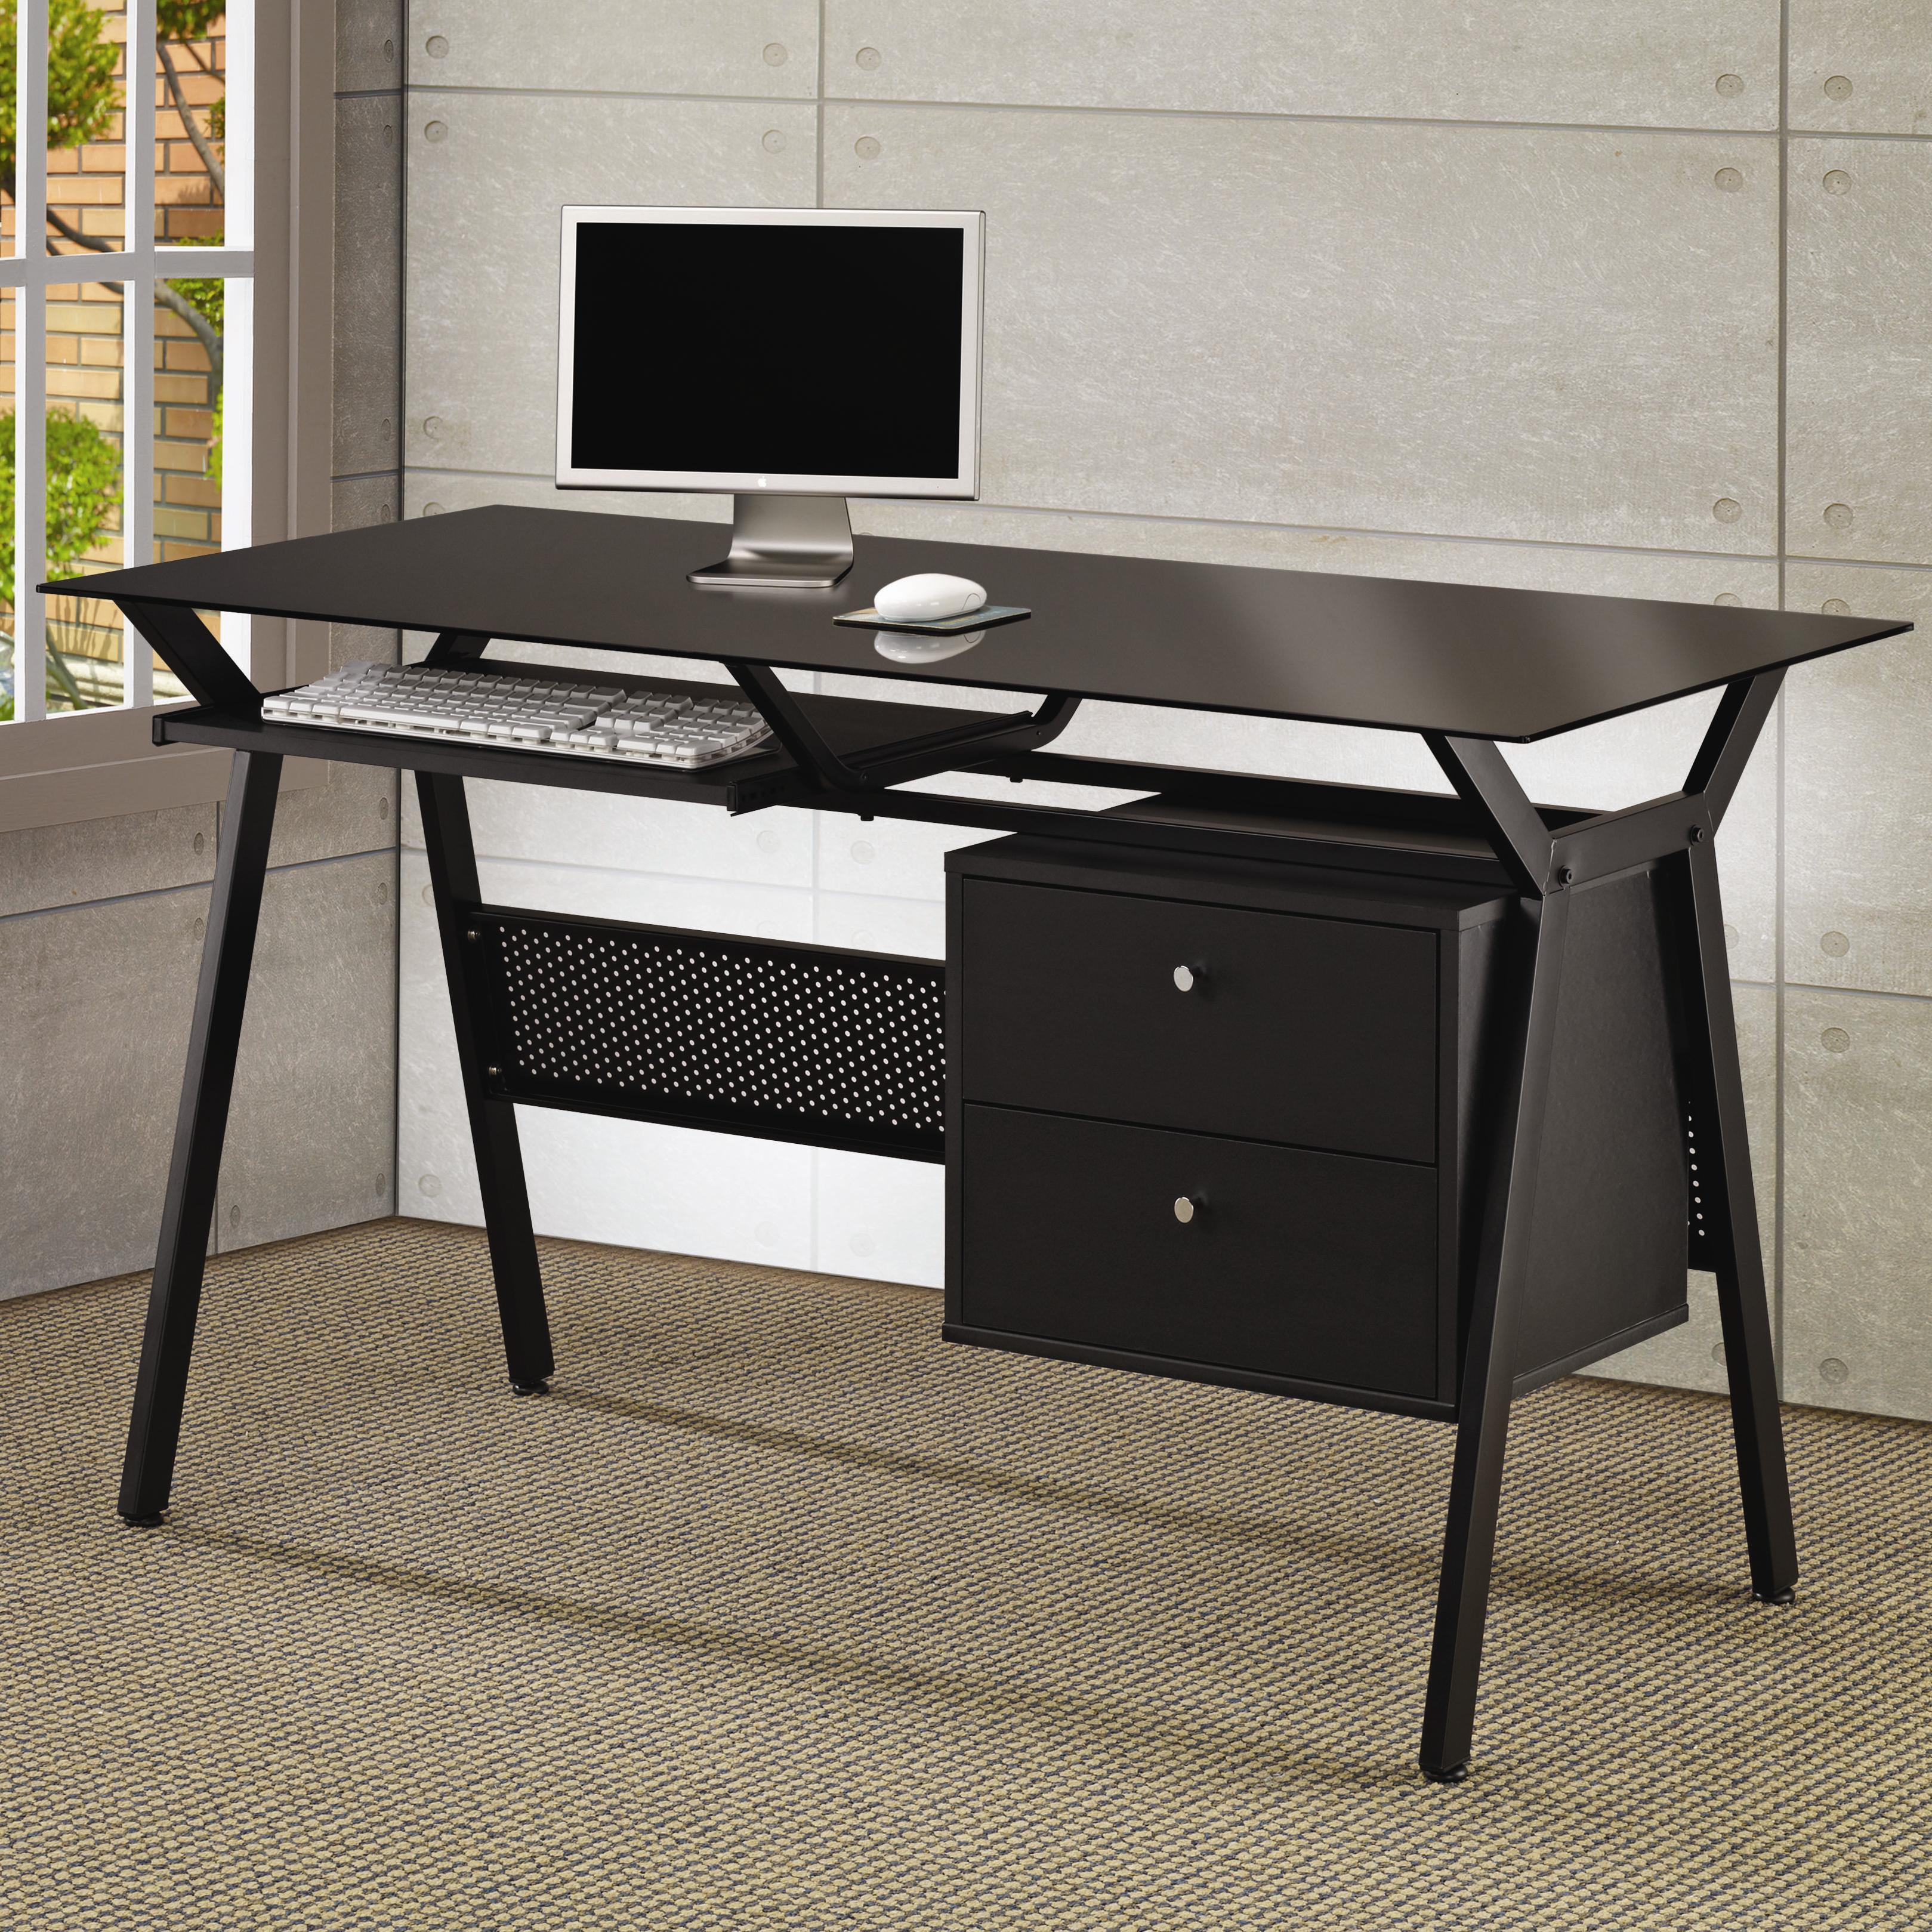 - Computer Desk by Coaster at Sam Levitz Outlet